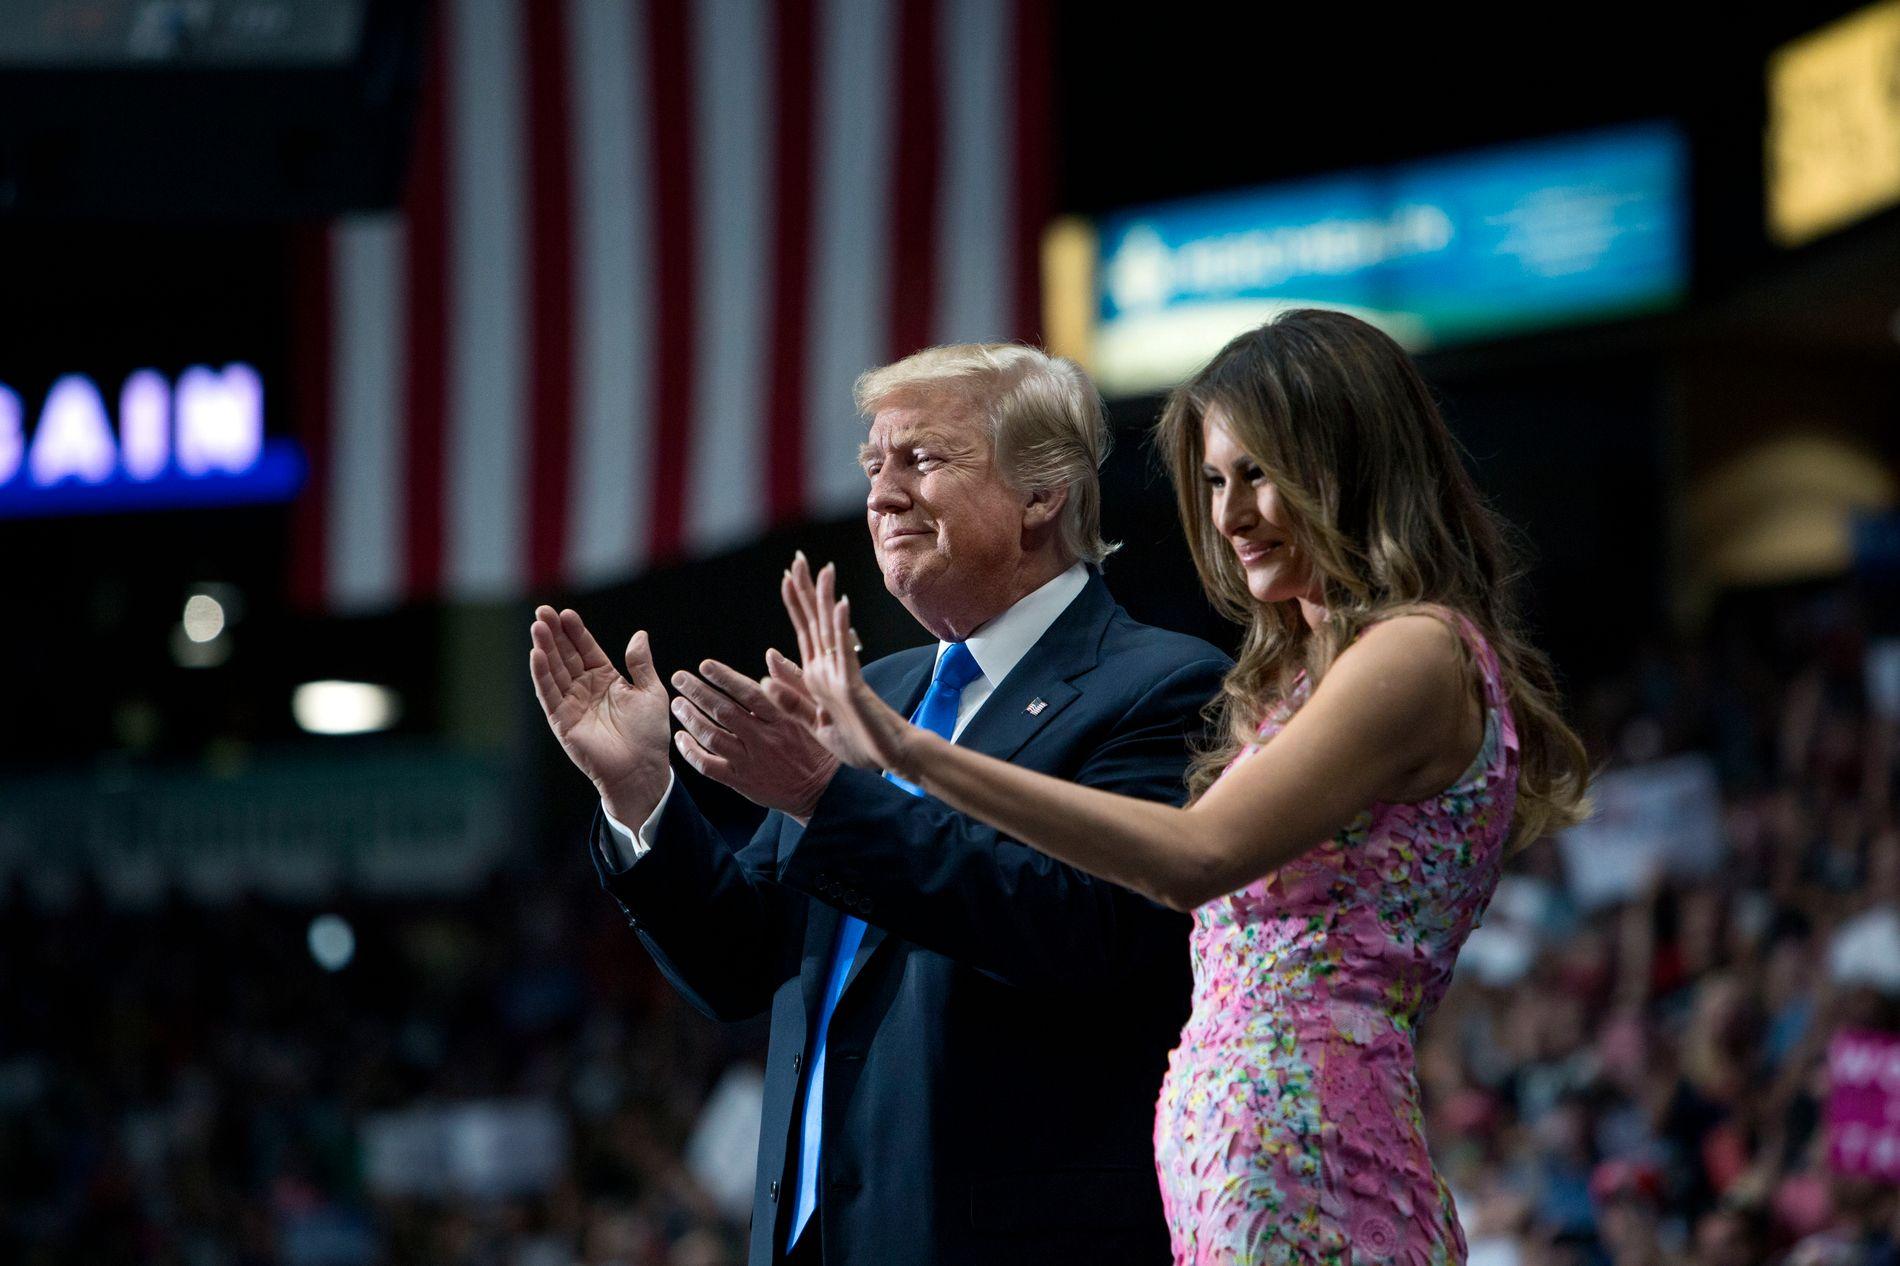 GIFT: Donald Trump her sammen med sin kone Melania under et arrangement i Youngstown, Ohio, tidligere i år.